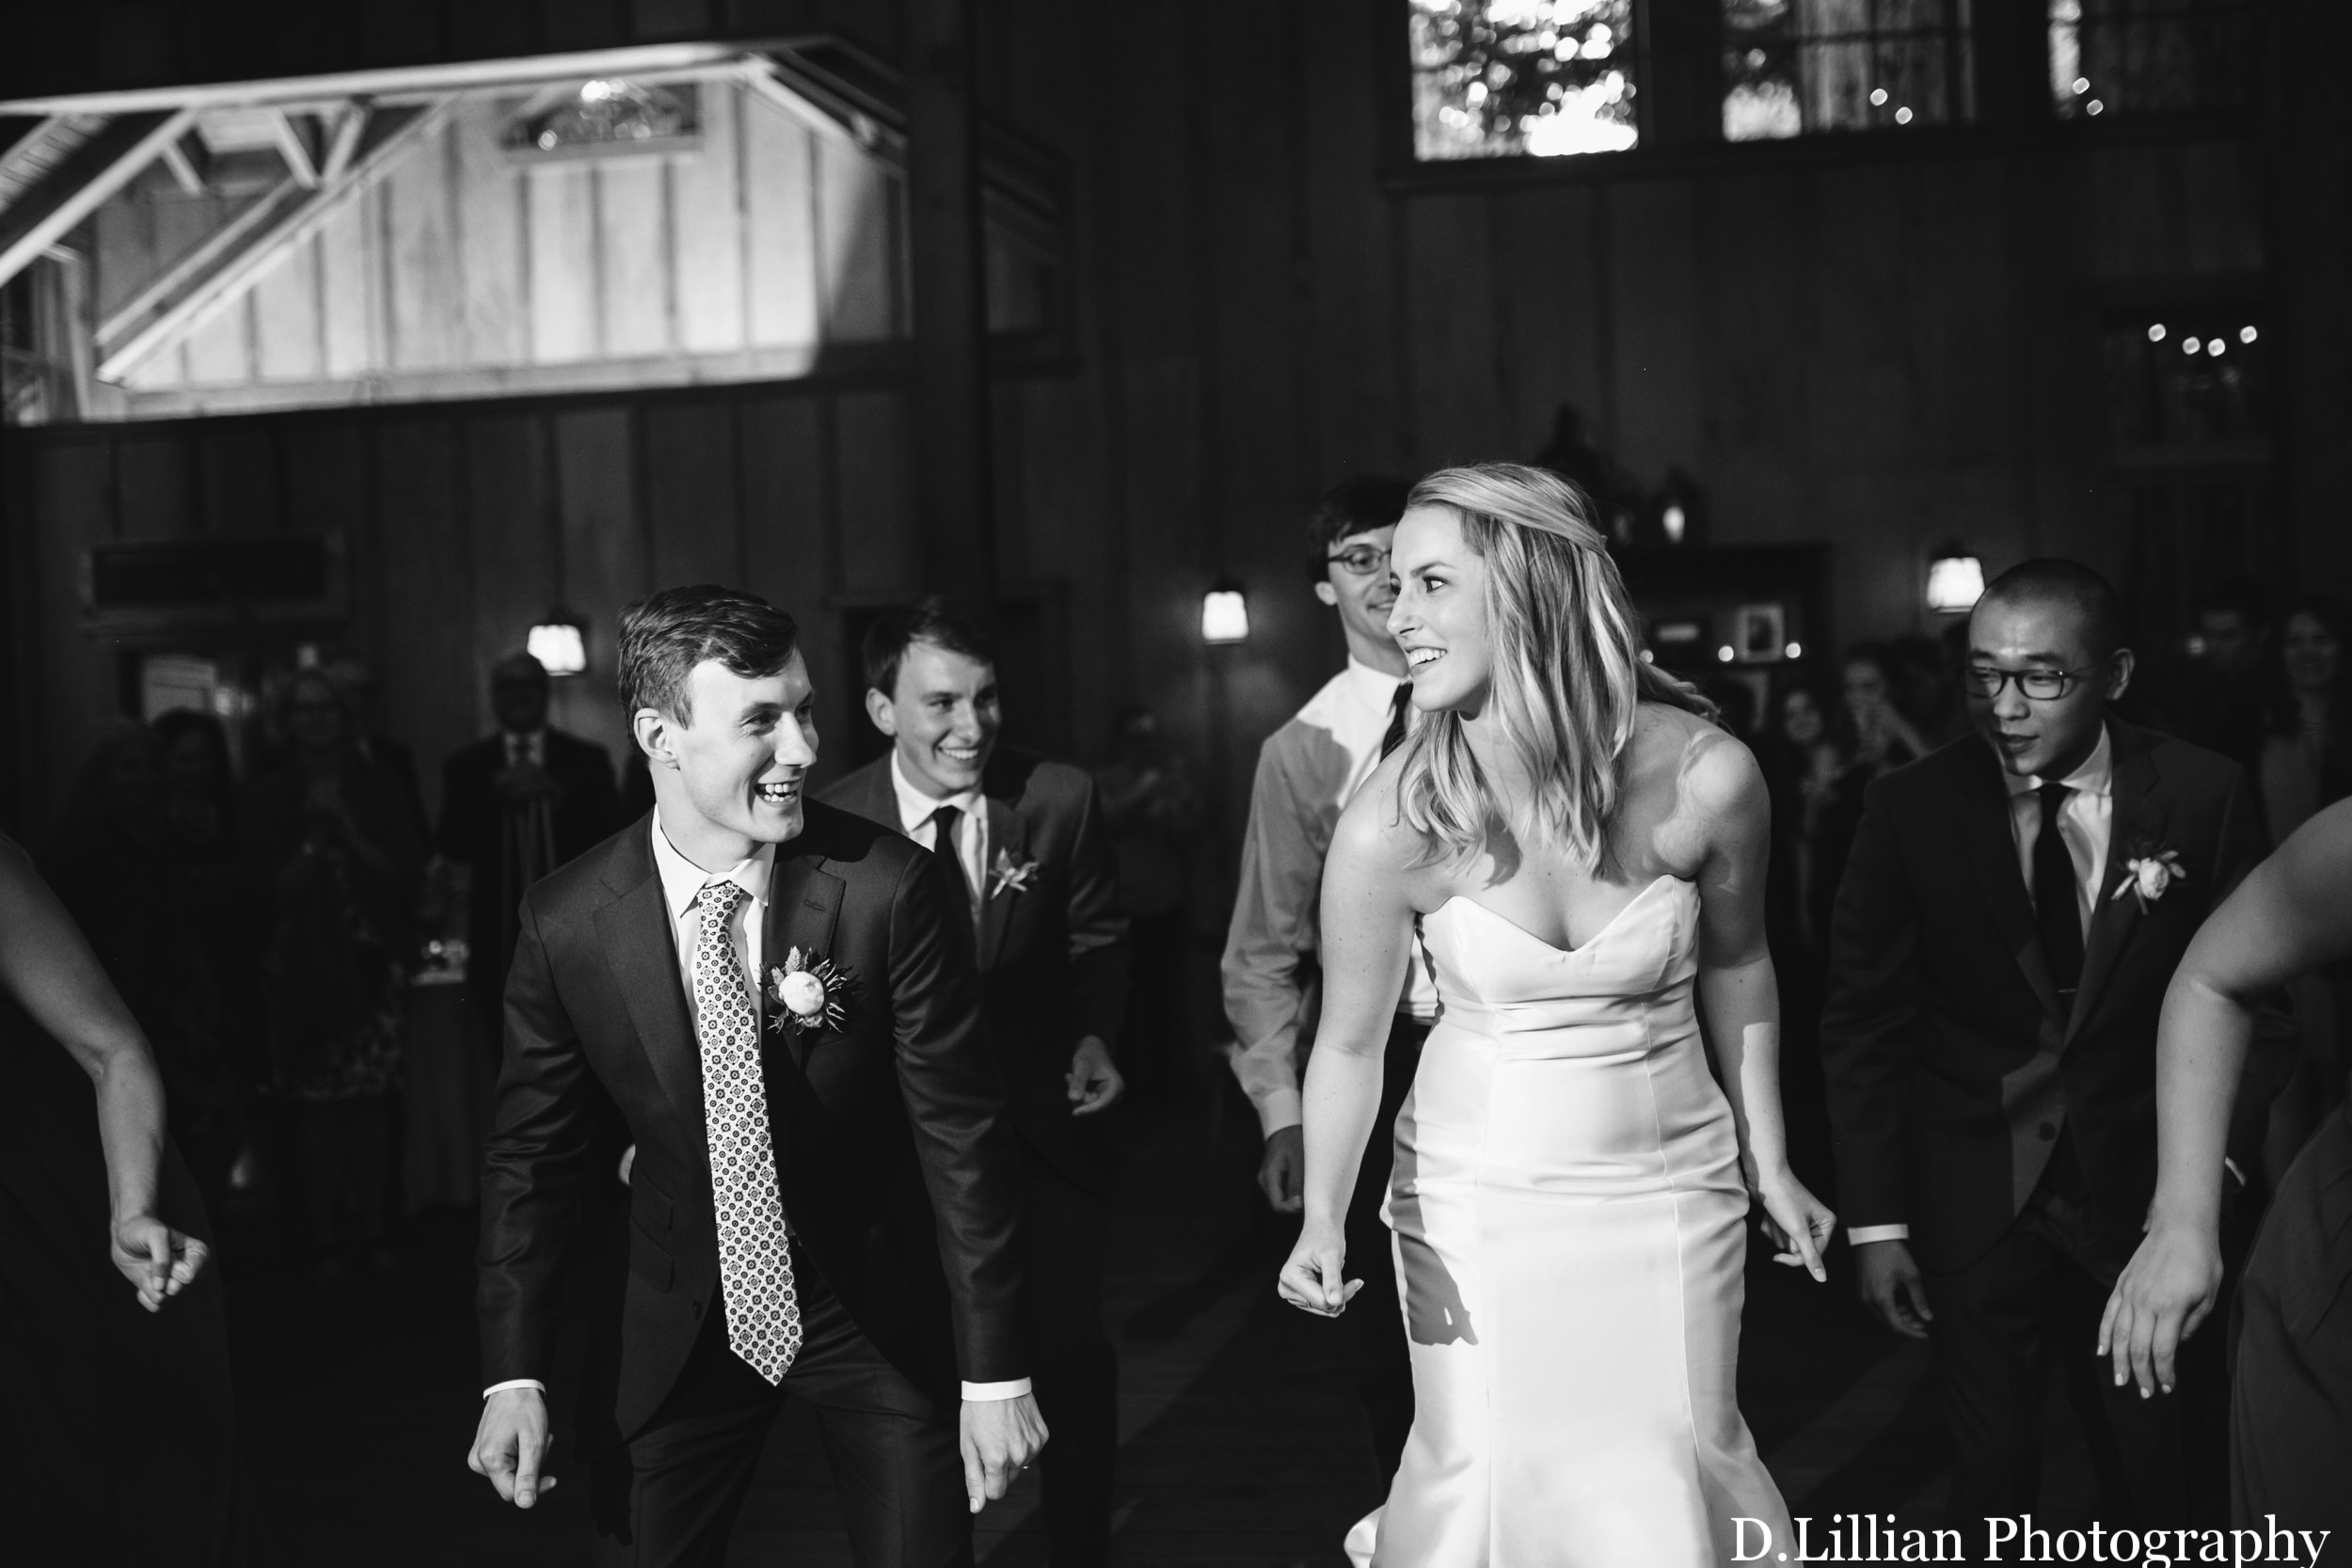 Los Gatos DJ - Nestldown Wedding Dance - Whitney &Alex-1032 - D.Lillian Photography.jpg